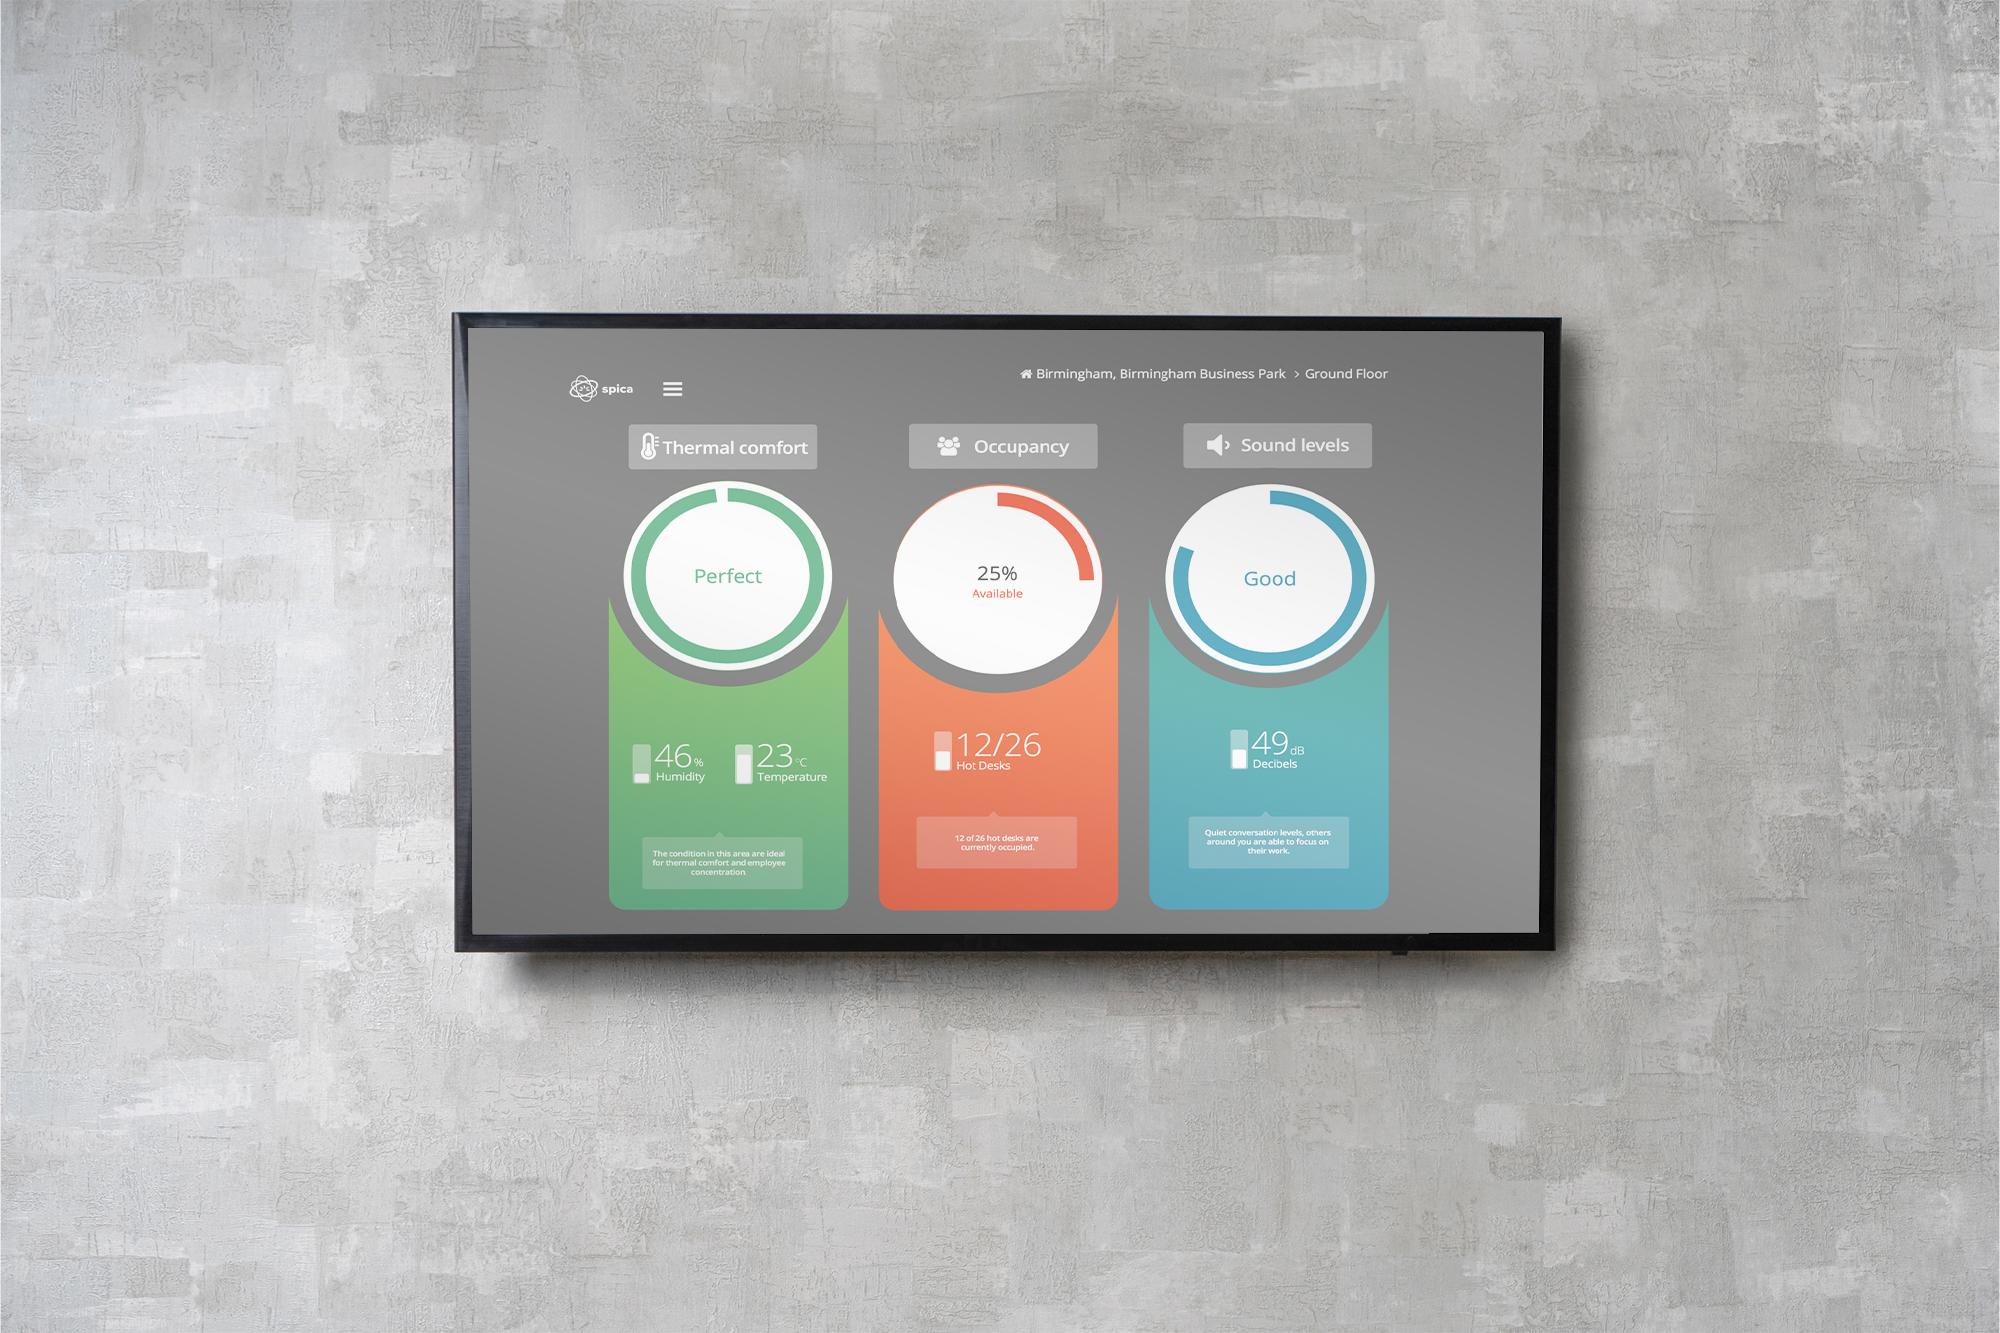 TV Kiosk View - Environment Air Quality Monitoring